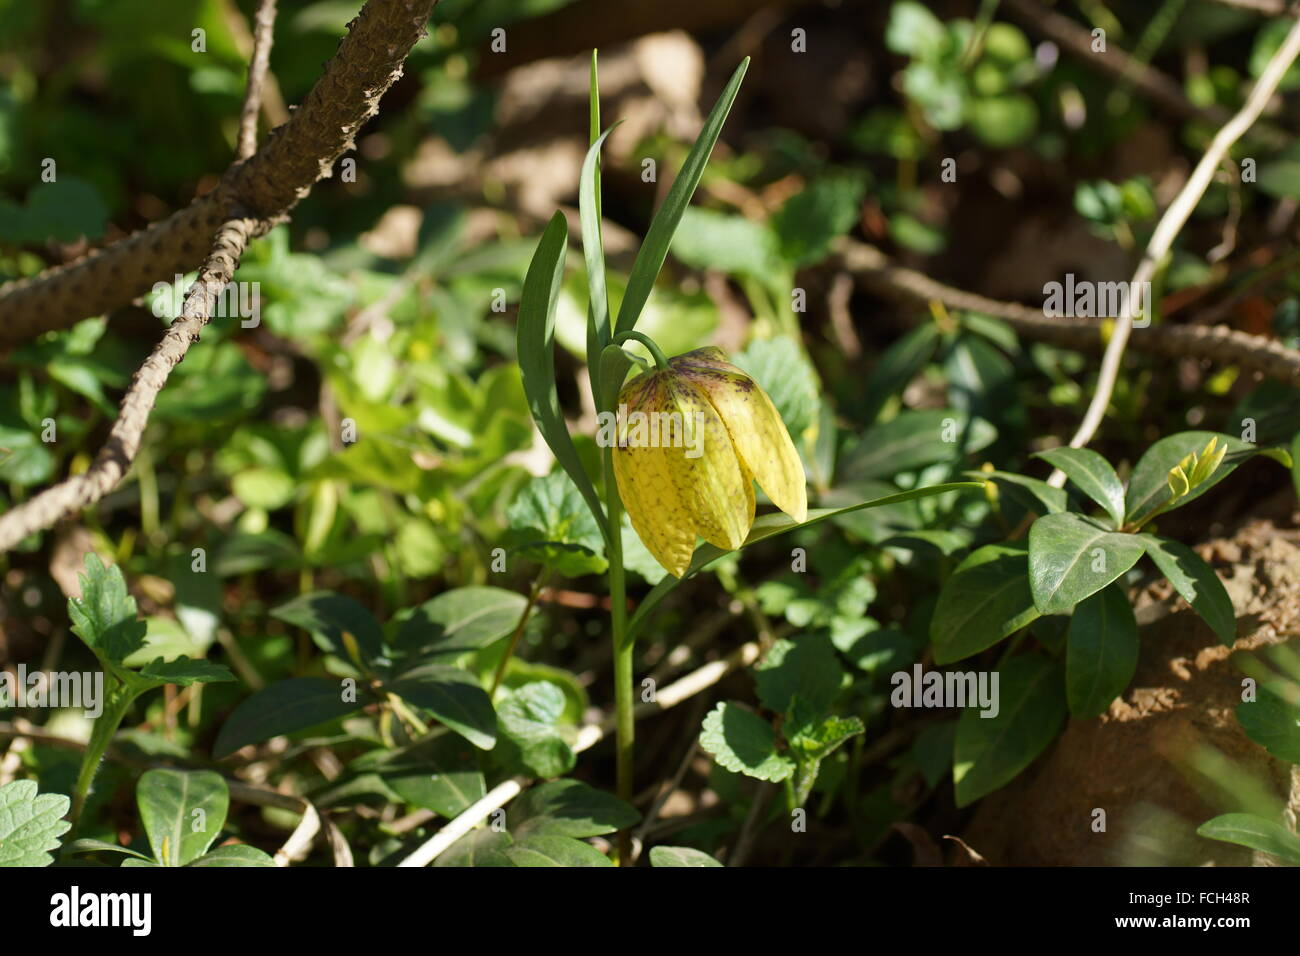 Fritillaria ophioglossifolia, Fritillaria lutea, Fritillaria biebersteiniana, Fritillaria lagodechiana - Stock Image